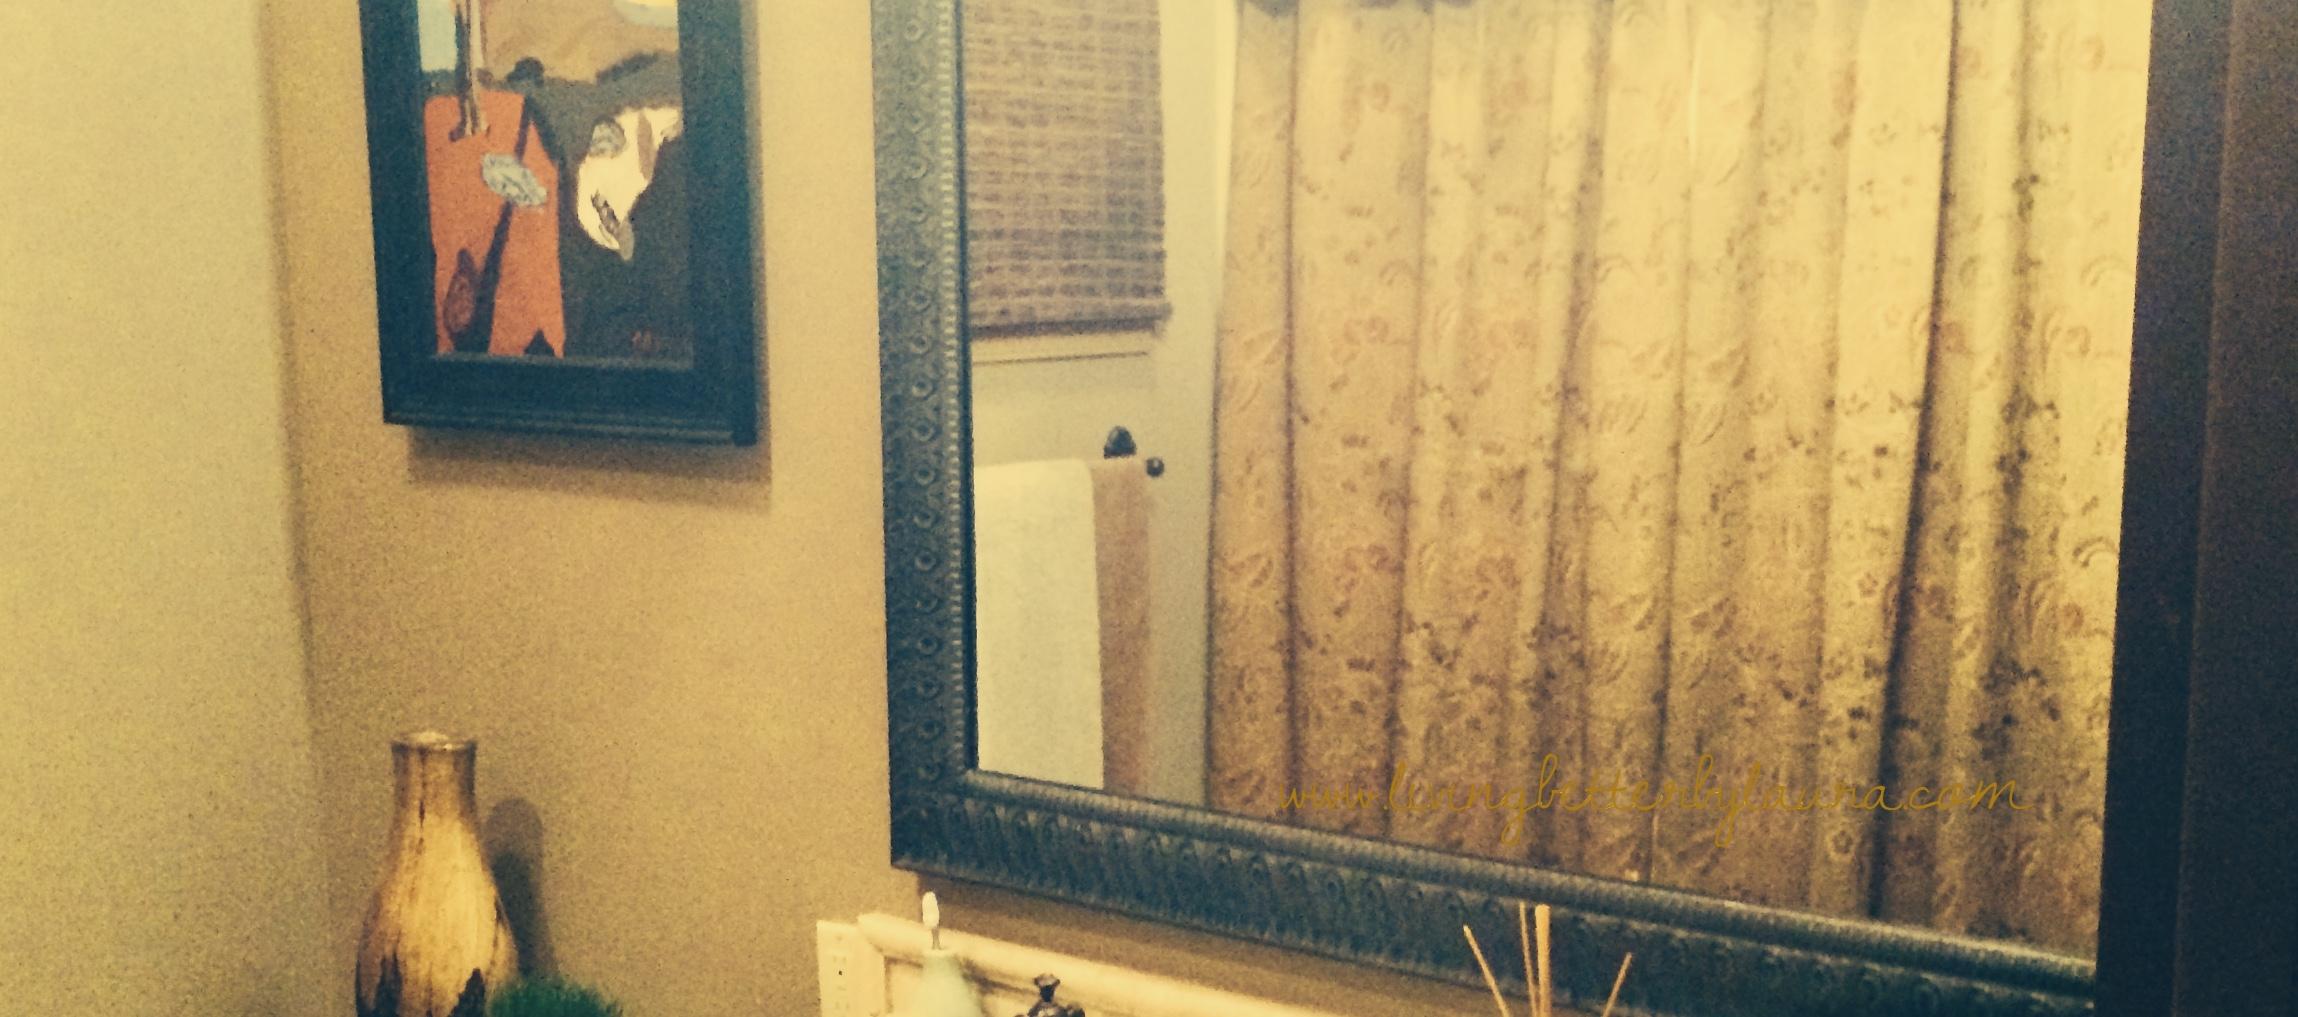 Before: mirror guest bath #1